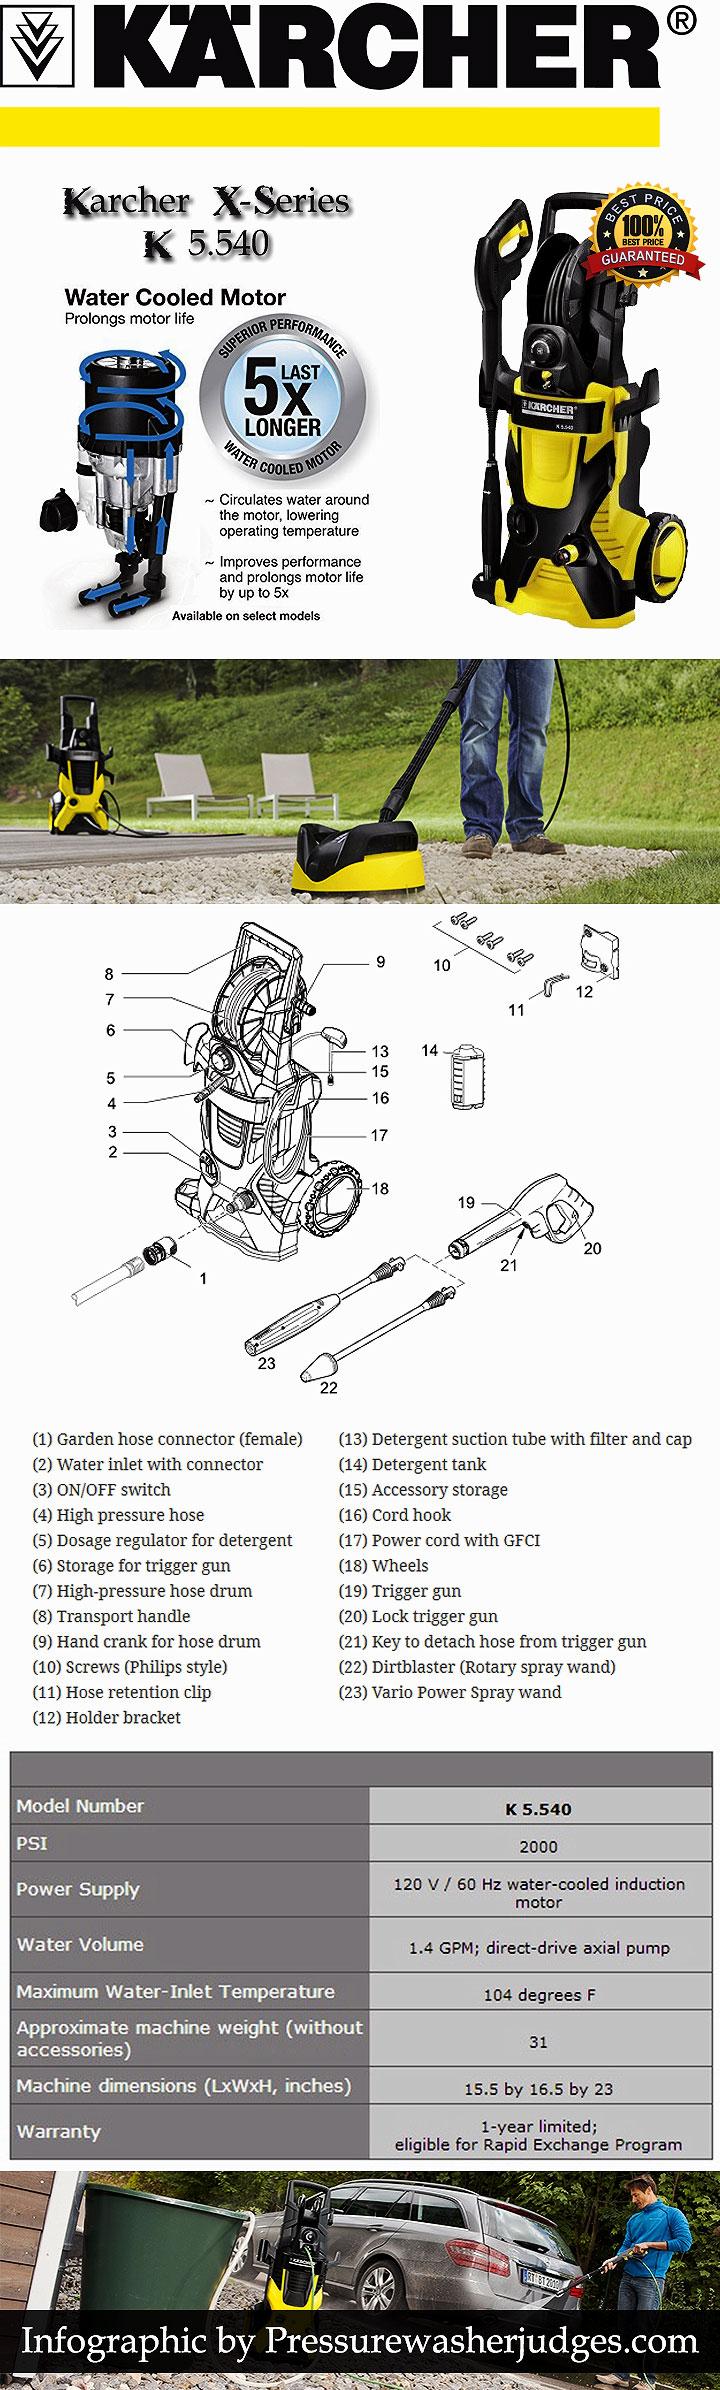 Infographic Karcher X-Series K 5.540